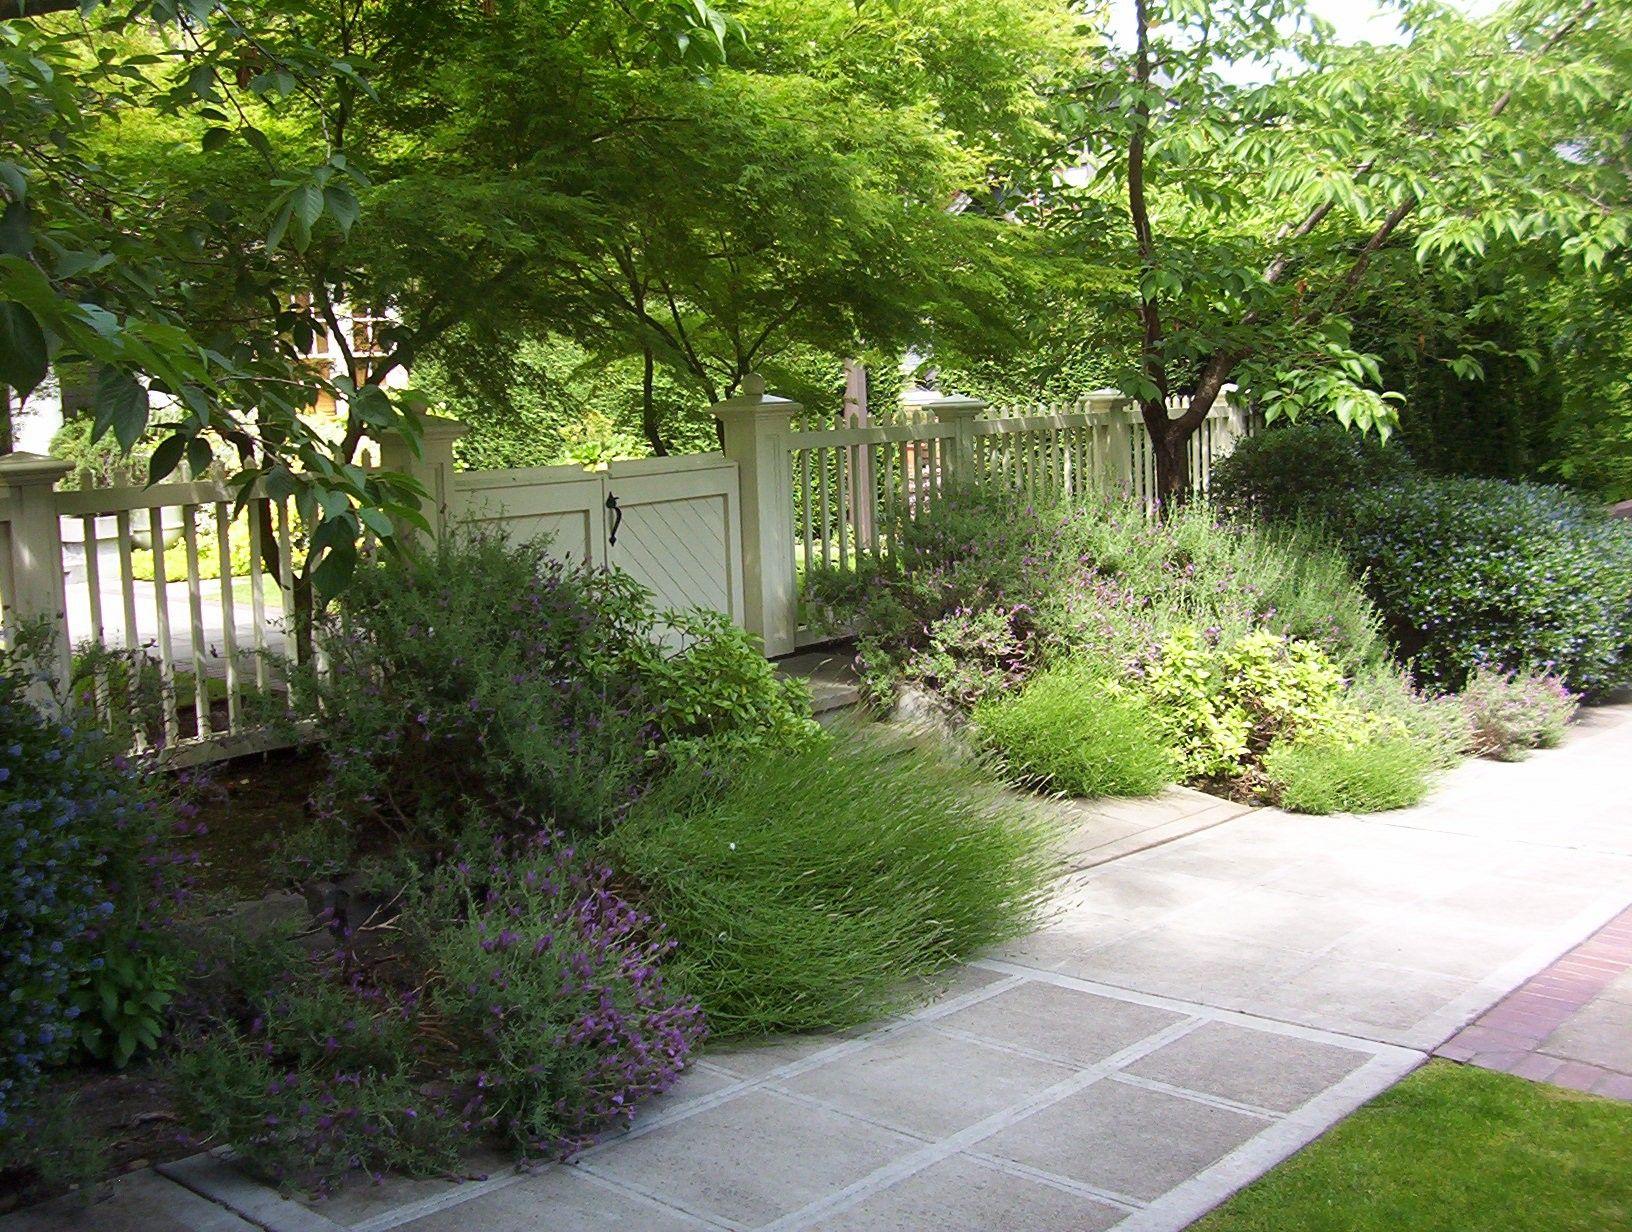 12 Inspiring Ideas for a Lawn-Free Landscape | Garden on a ...